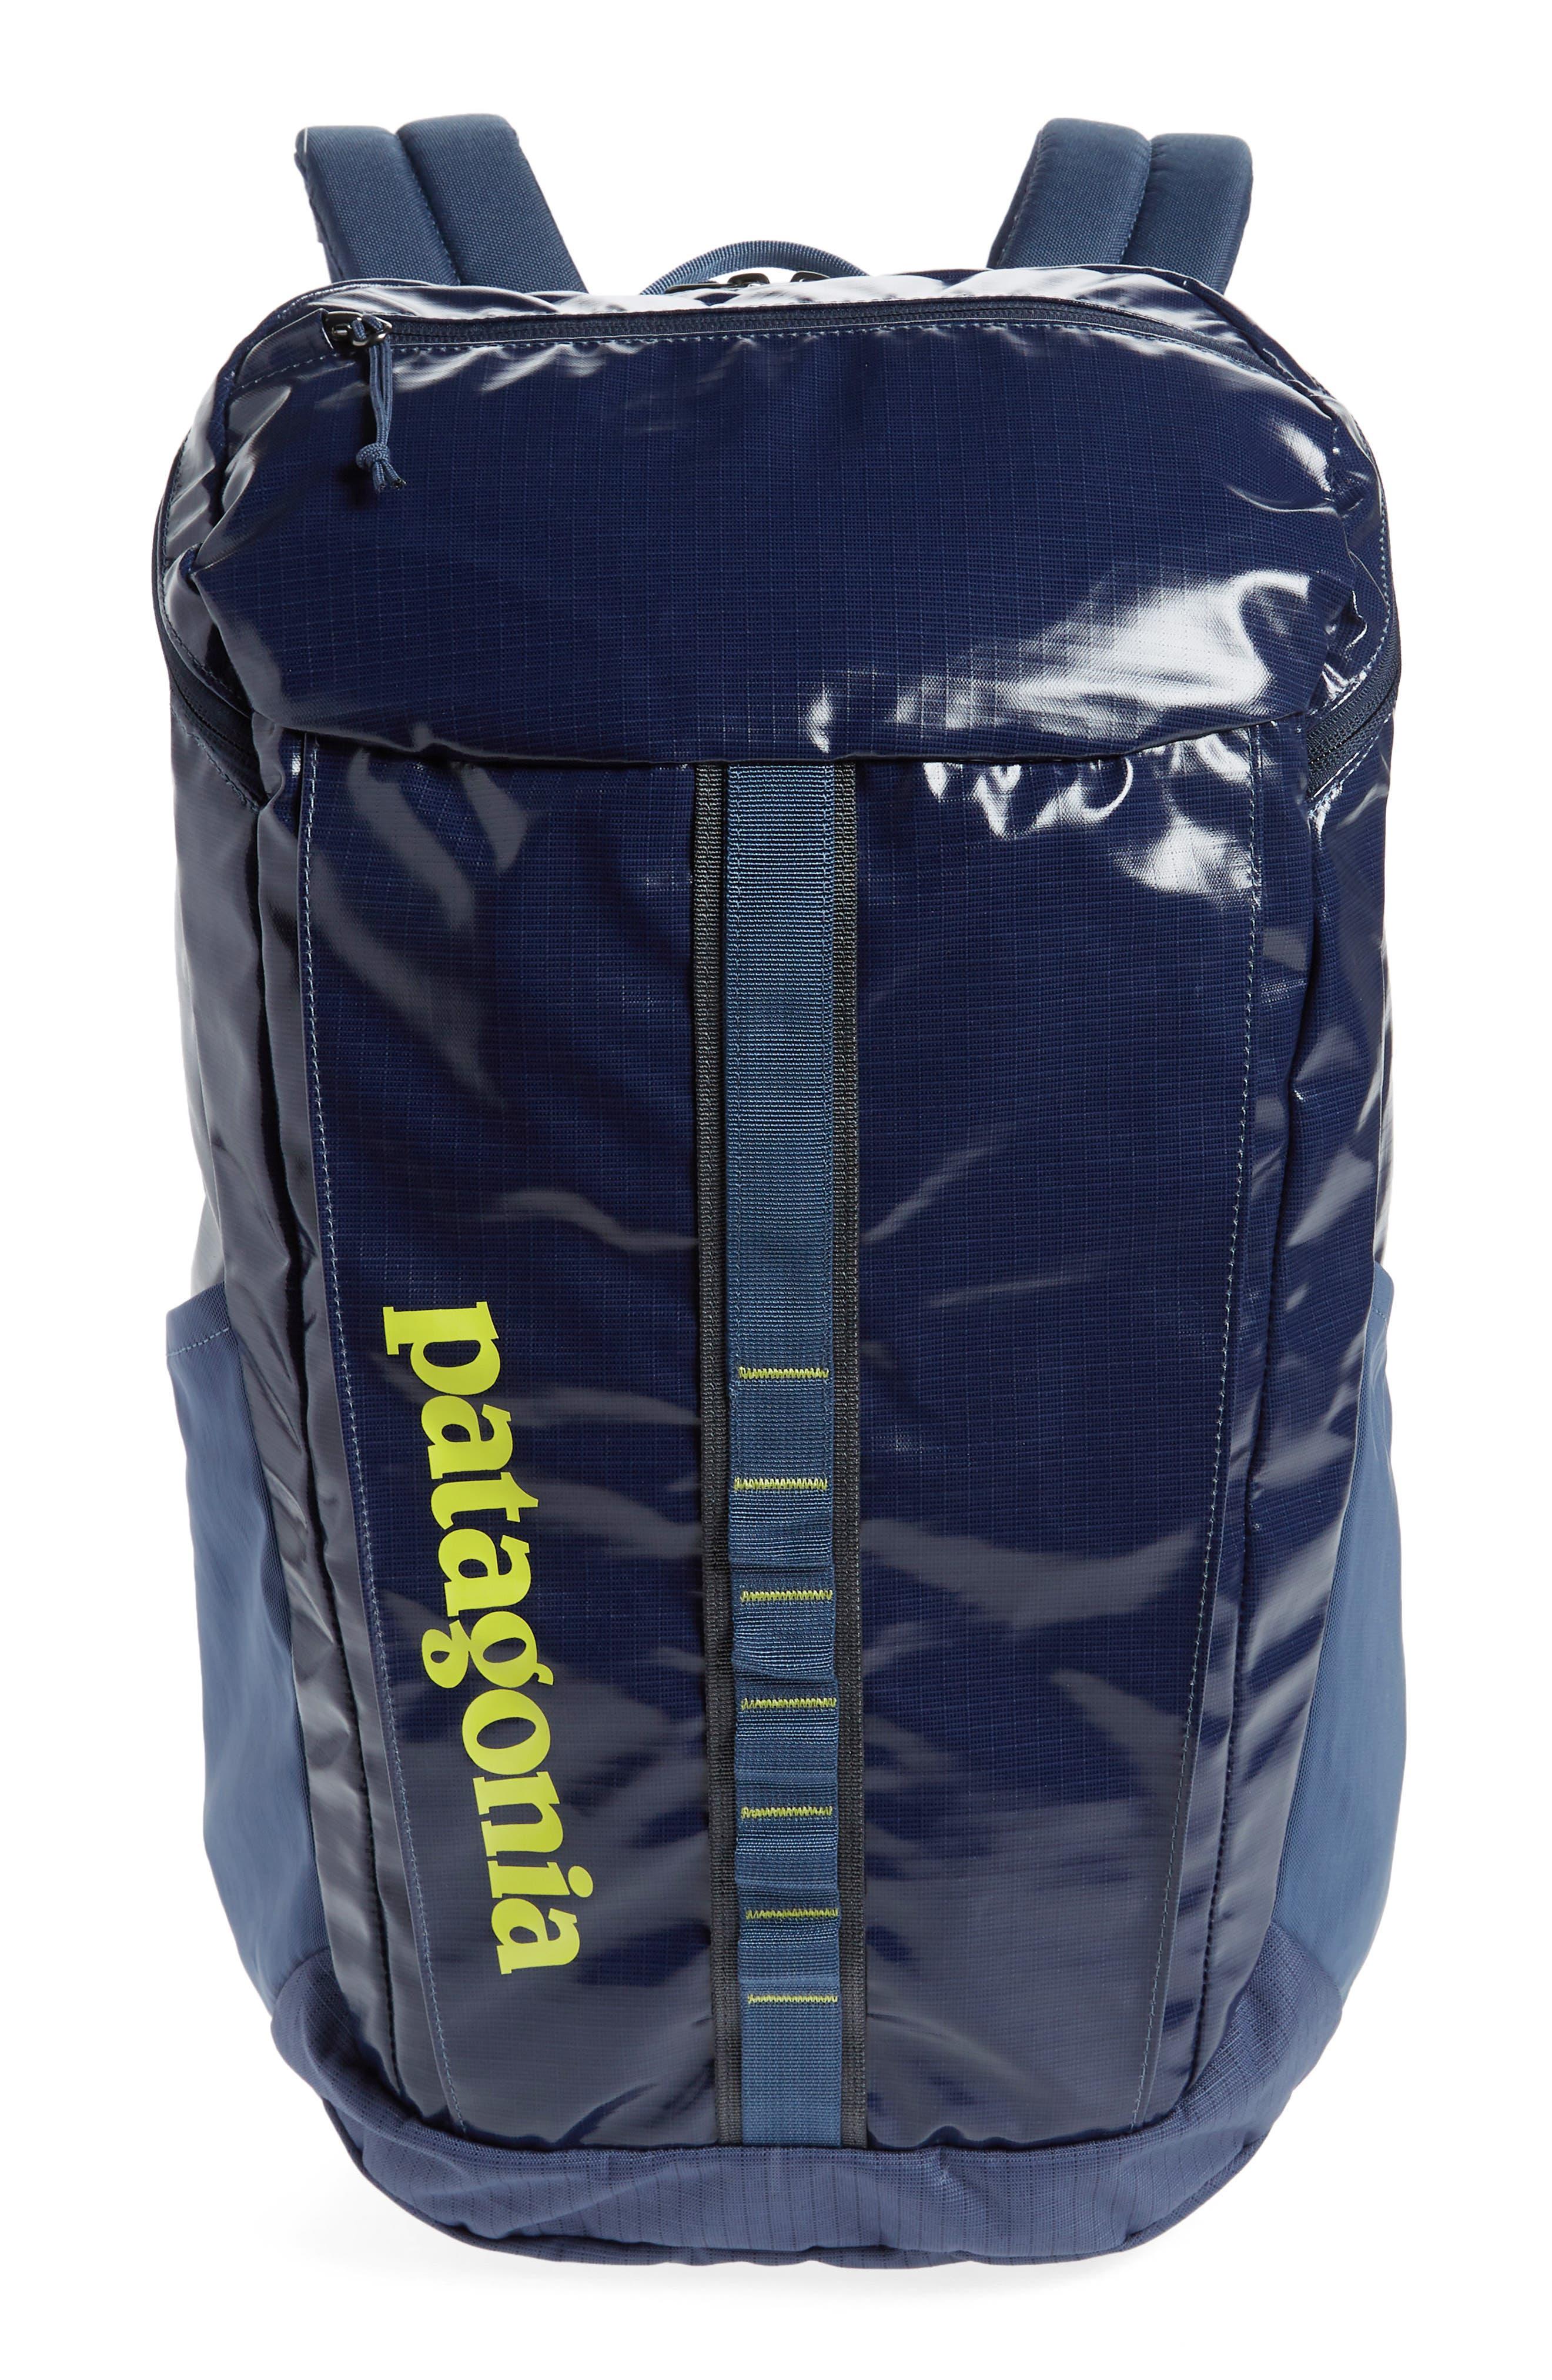 Black Hole 25 Liter Backpack,                             Main thumbnail 1, color,                             DOLOMITE BLUE